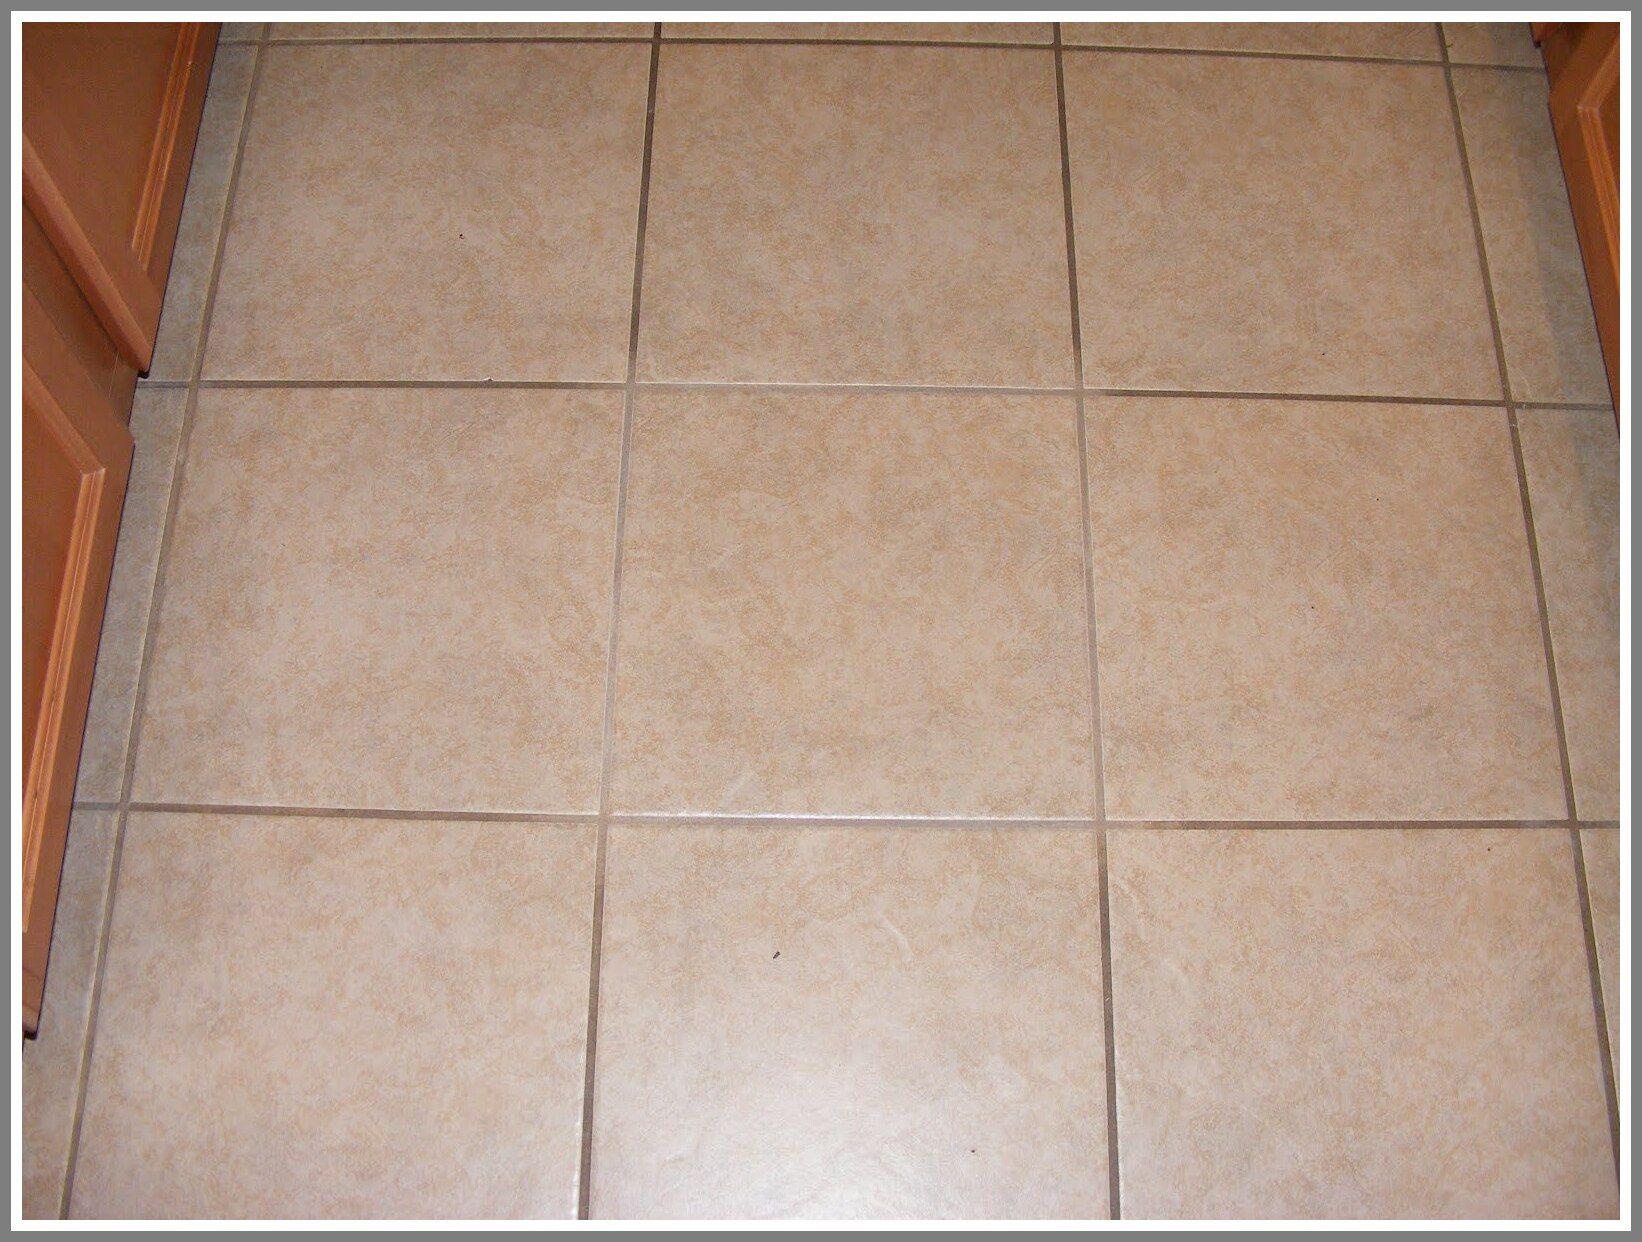 47 Reference Of Ceramic Floor Tile Chilo Gray Baking Soda In 2020 Ceramic Floor Tile Tile Floor Kitchen Cabinet Design